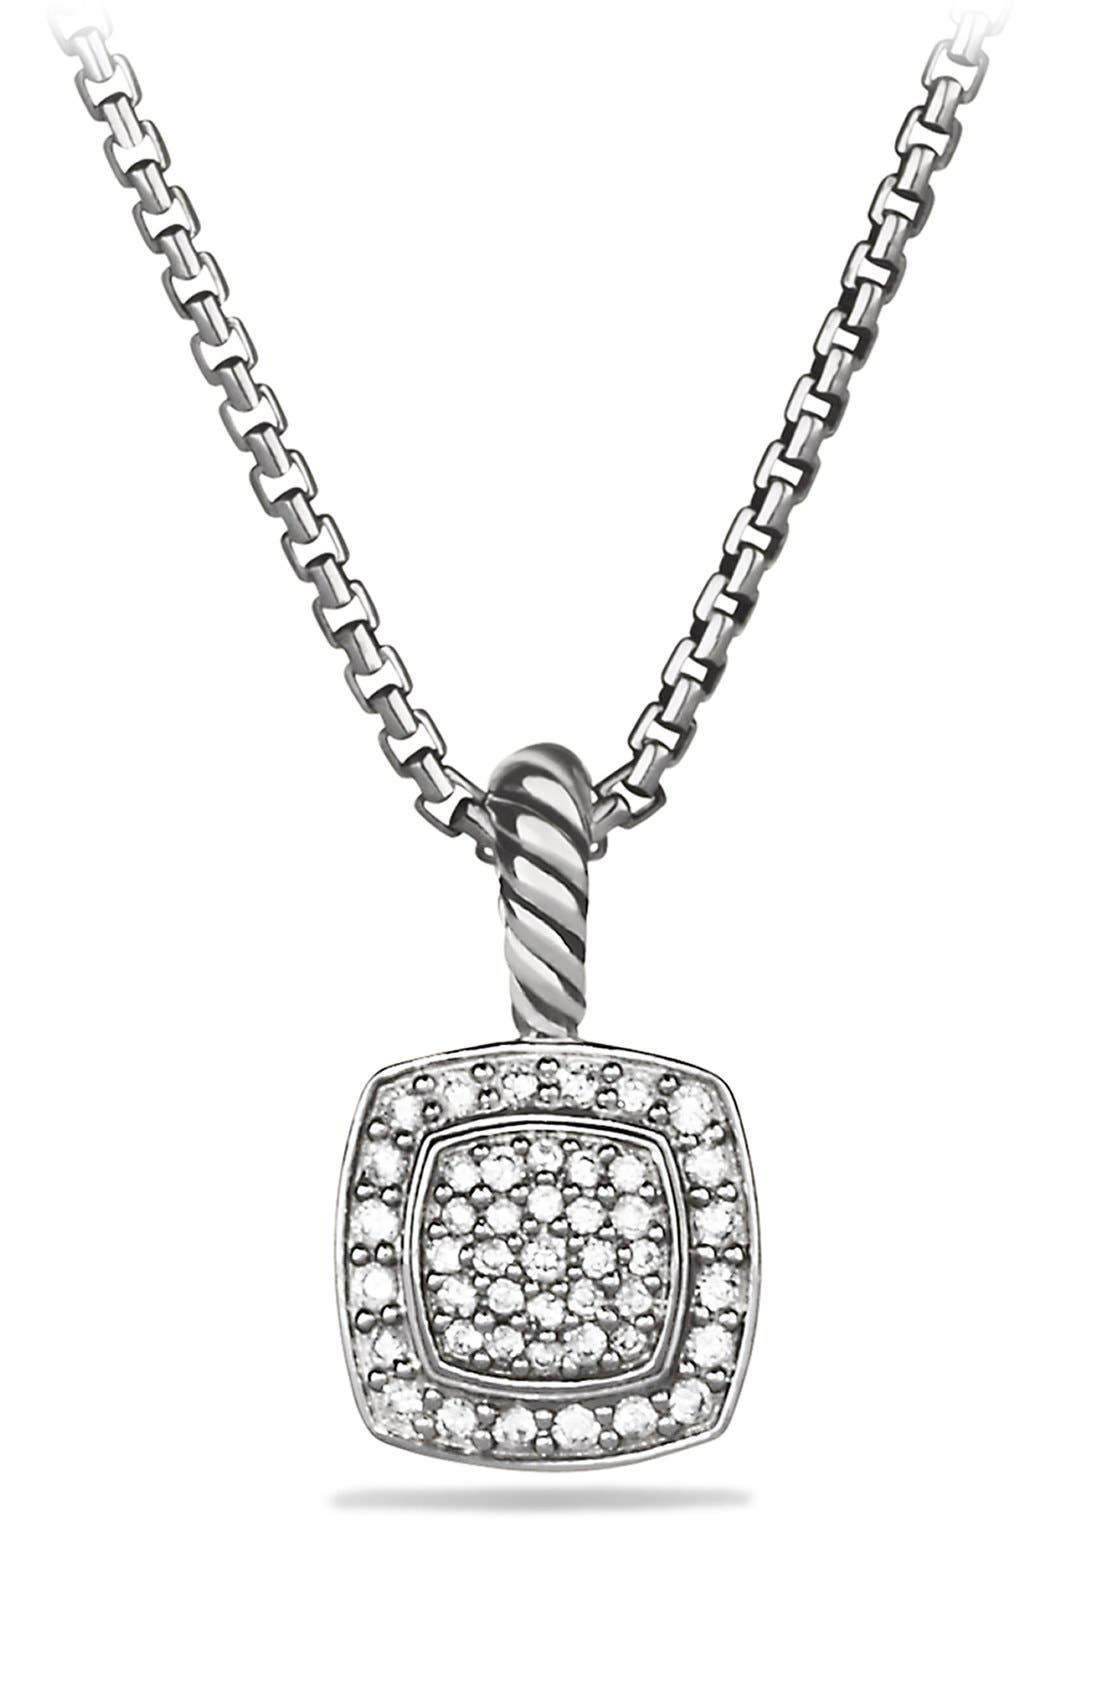 DAVID YURMAN Albion Petite Pendant with Diamonds on Chain